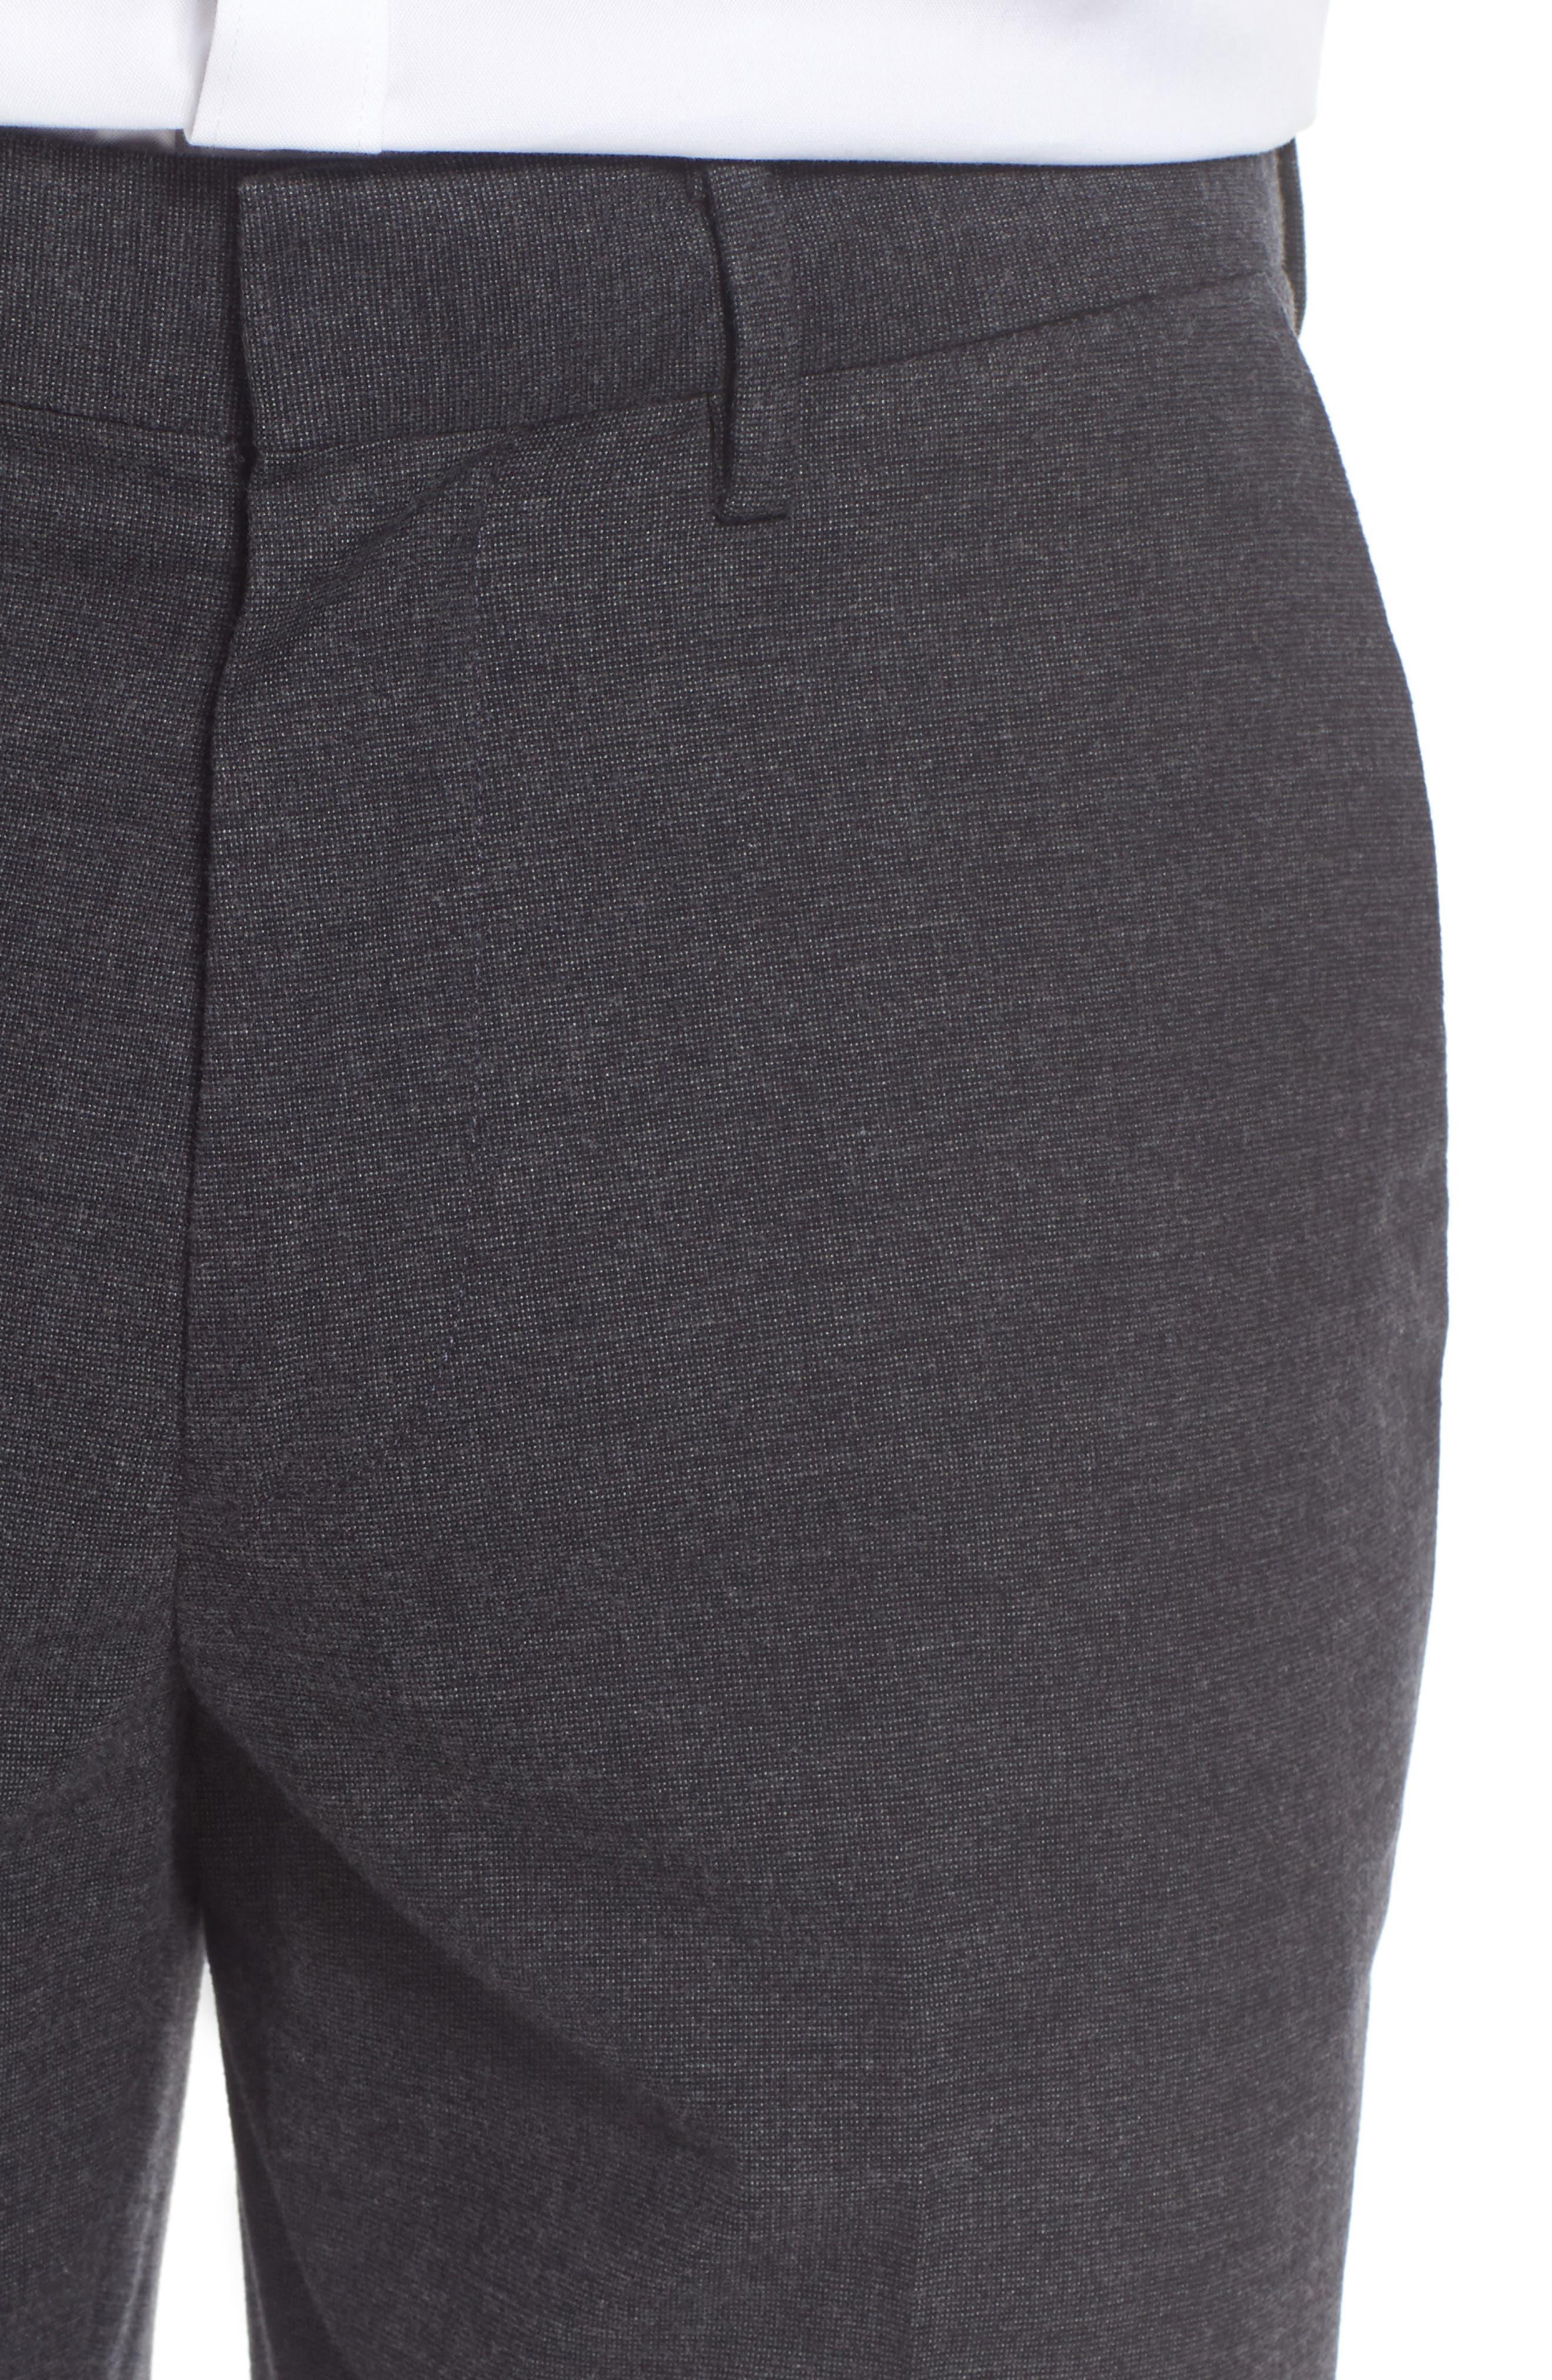 Alternate Image 4  - Bonobos Foundation Slim Fit Trousers